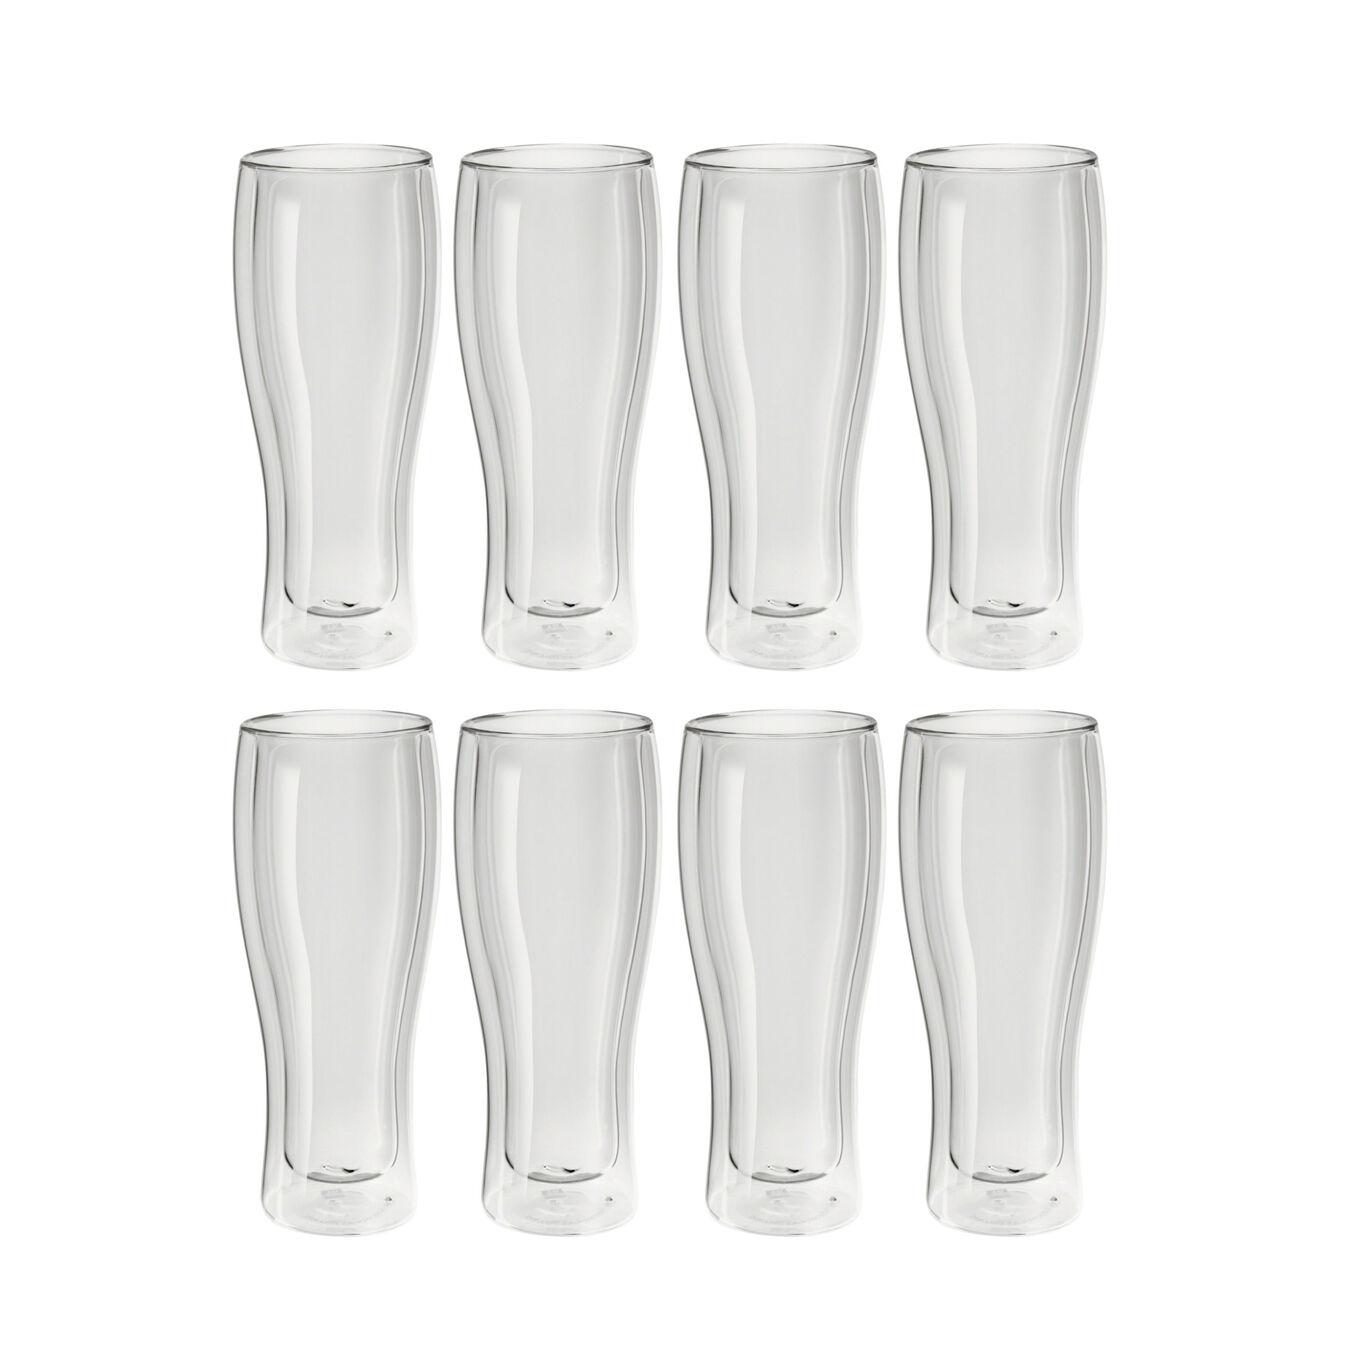 8 Piece Beer glass set - Buy 6 Get 8,,large 1